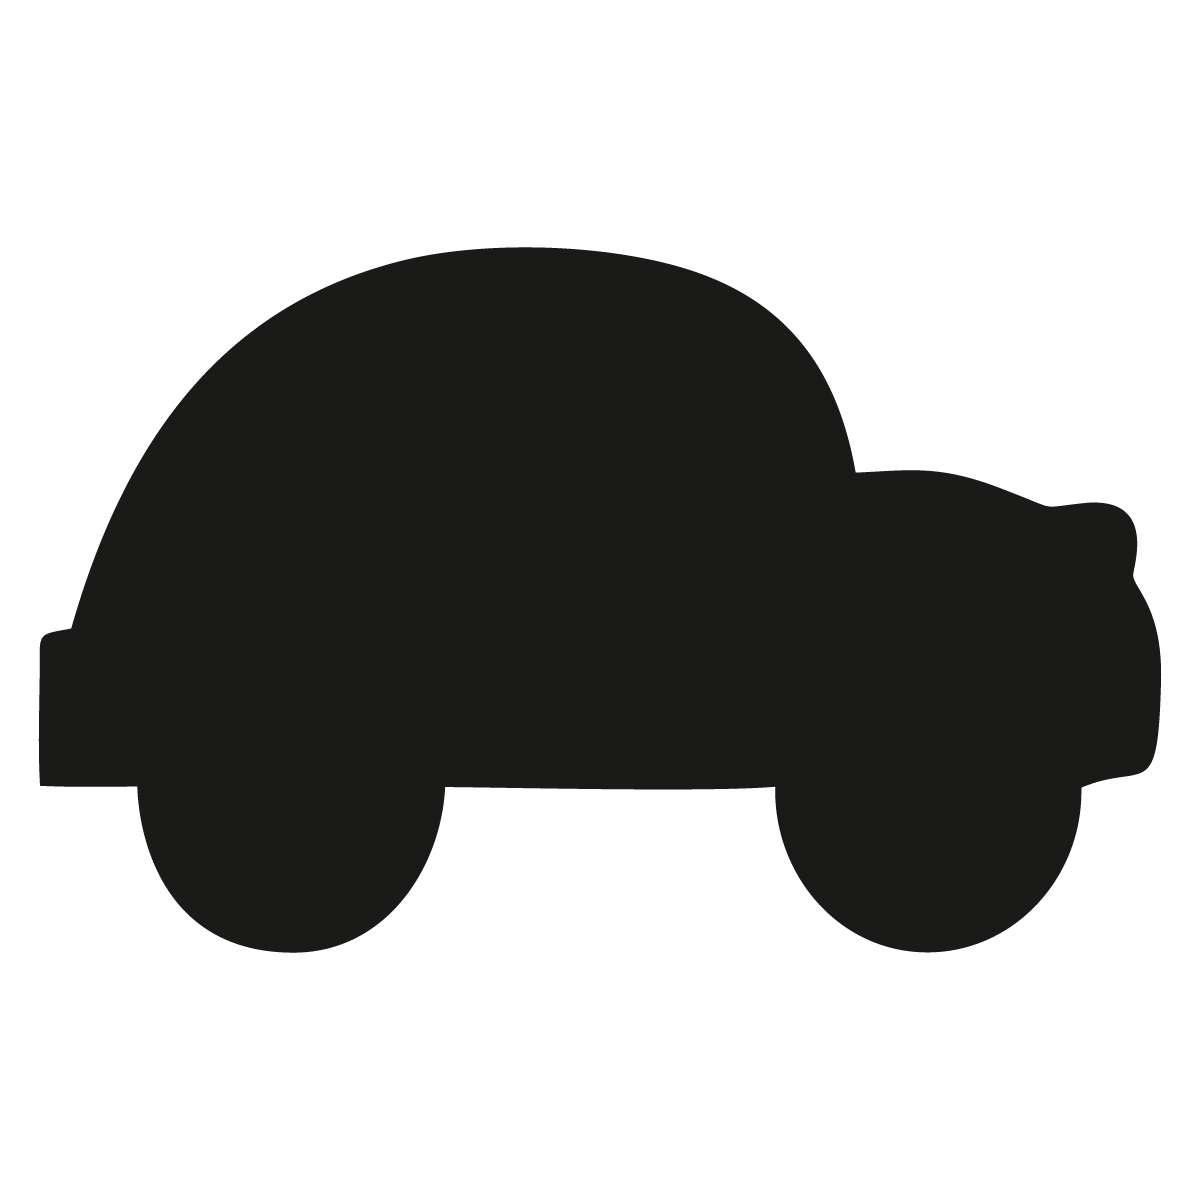 Tafelaufkleber Car